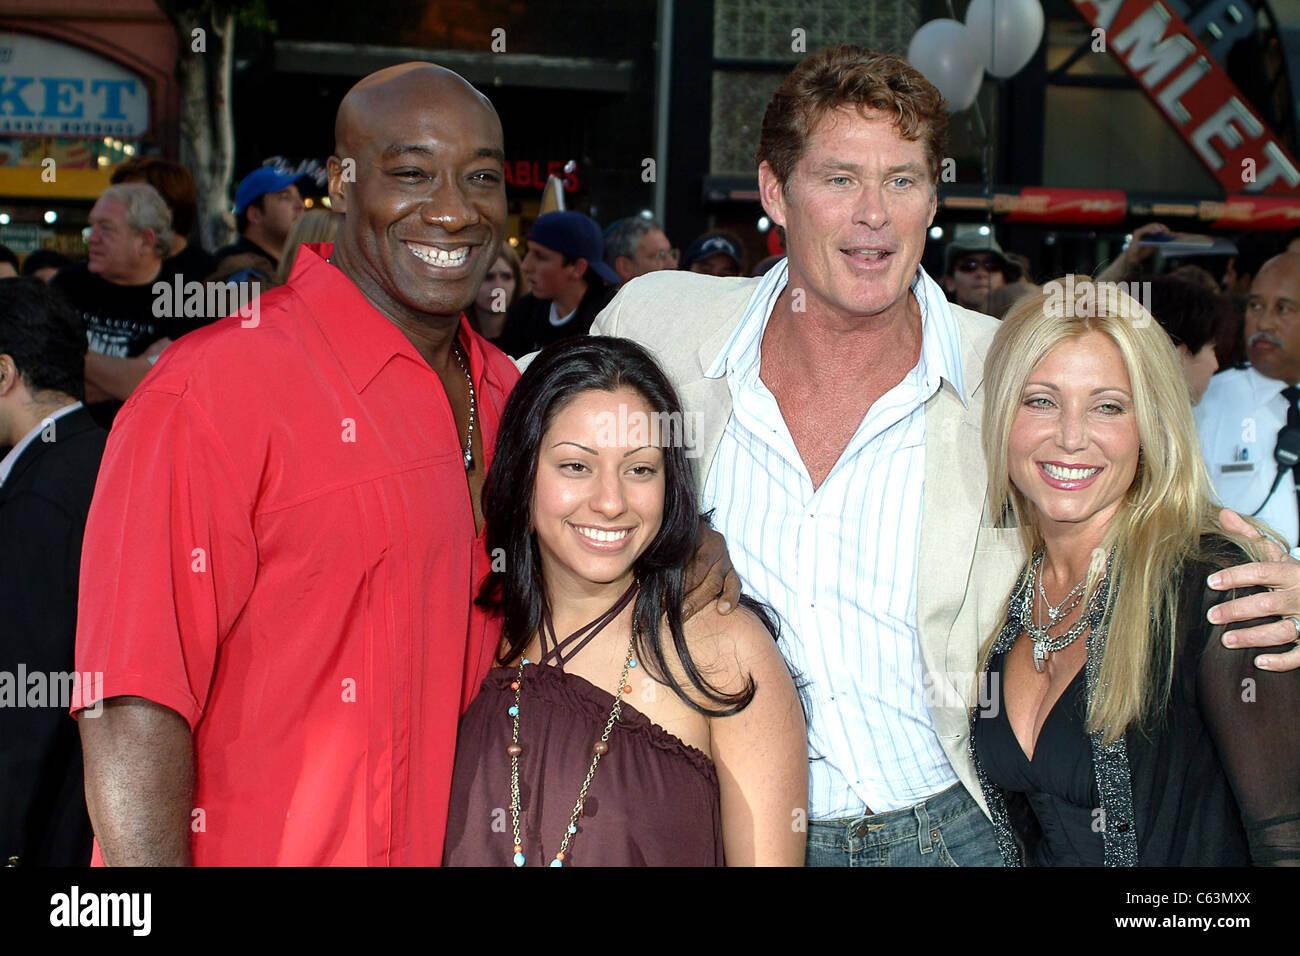 Michael Clarke Duncan Wife David Hasselhoff Wife At